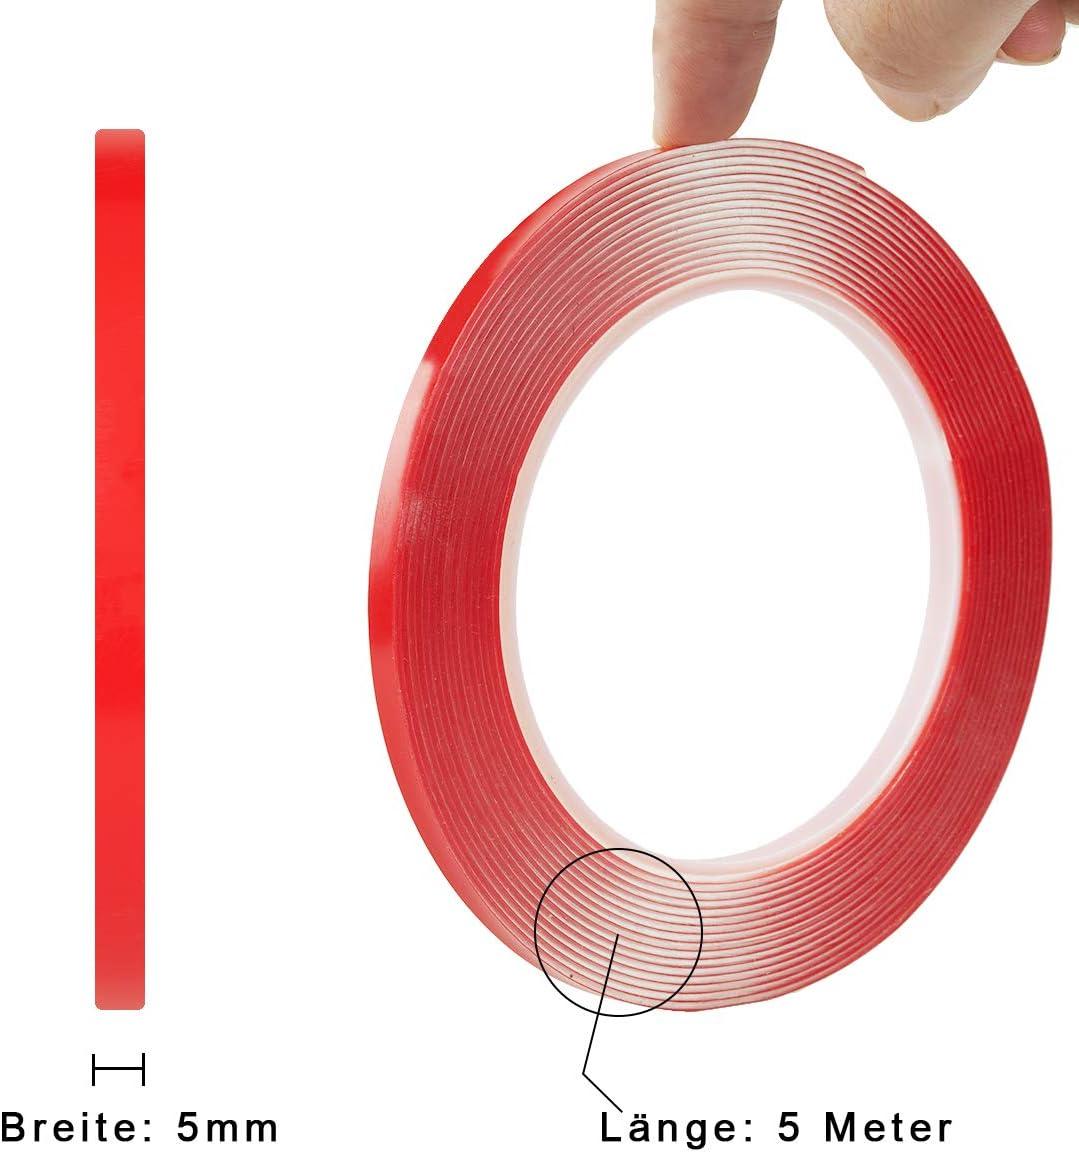 15mm Doppel-Band Sticky Tape 2 St Heavy Duty Doppelseitiges Klebeband 5 Meter L/änge Acryl Klar Montageklebeband